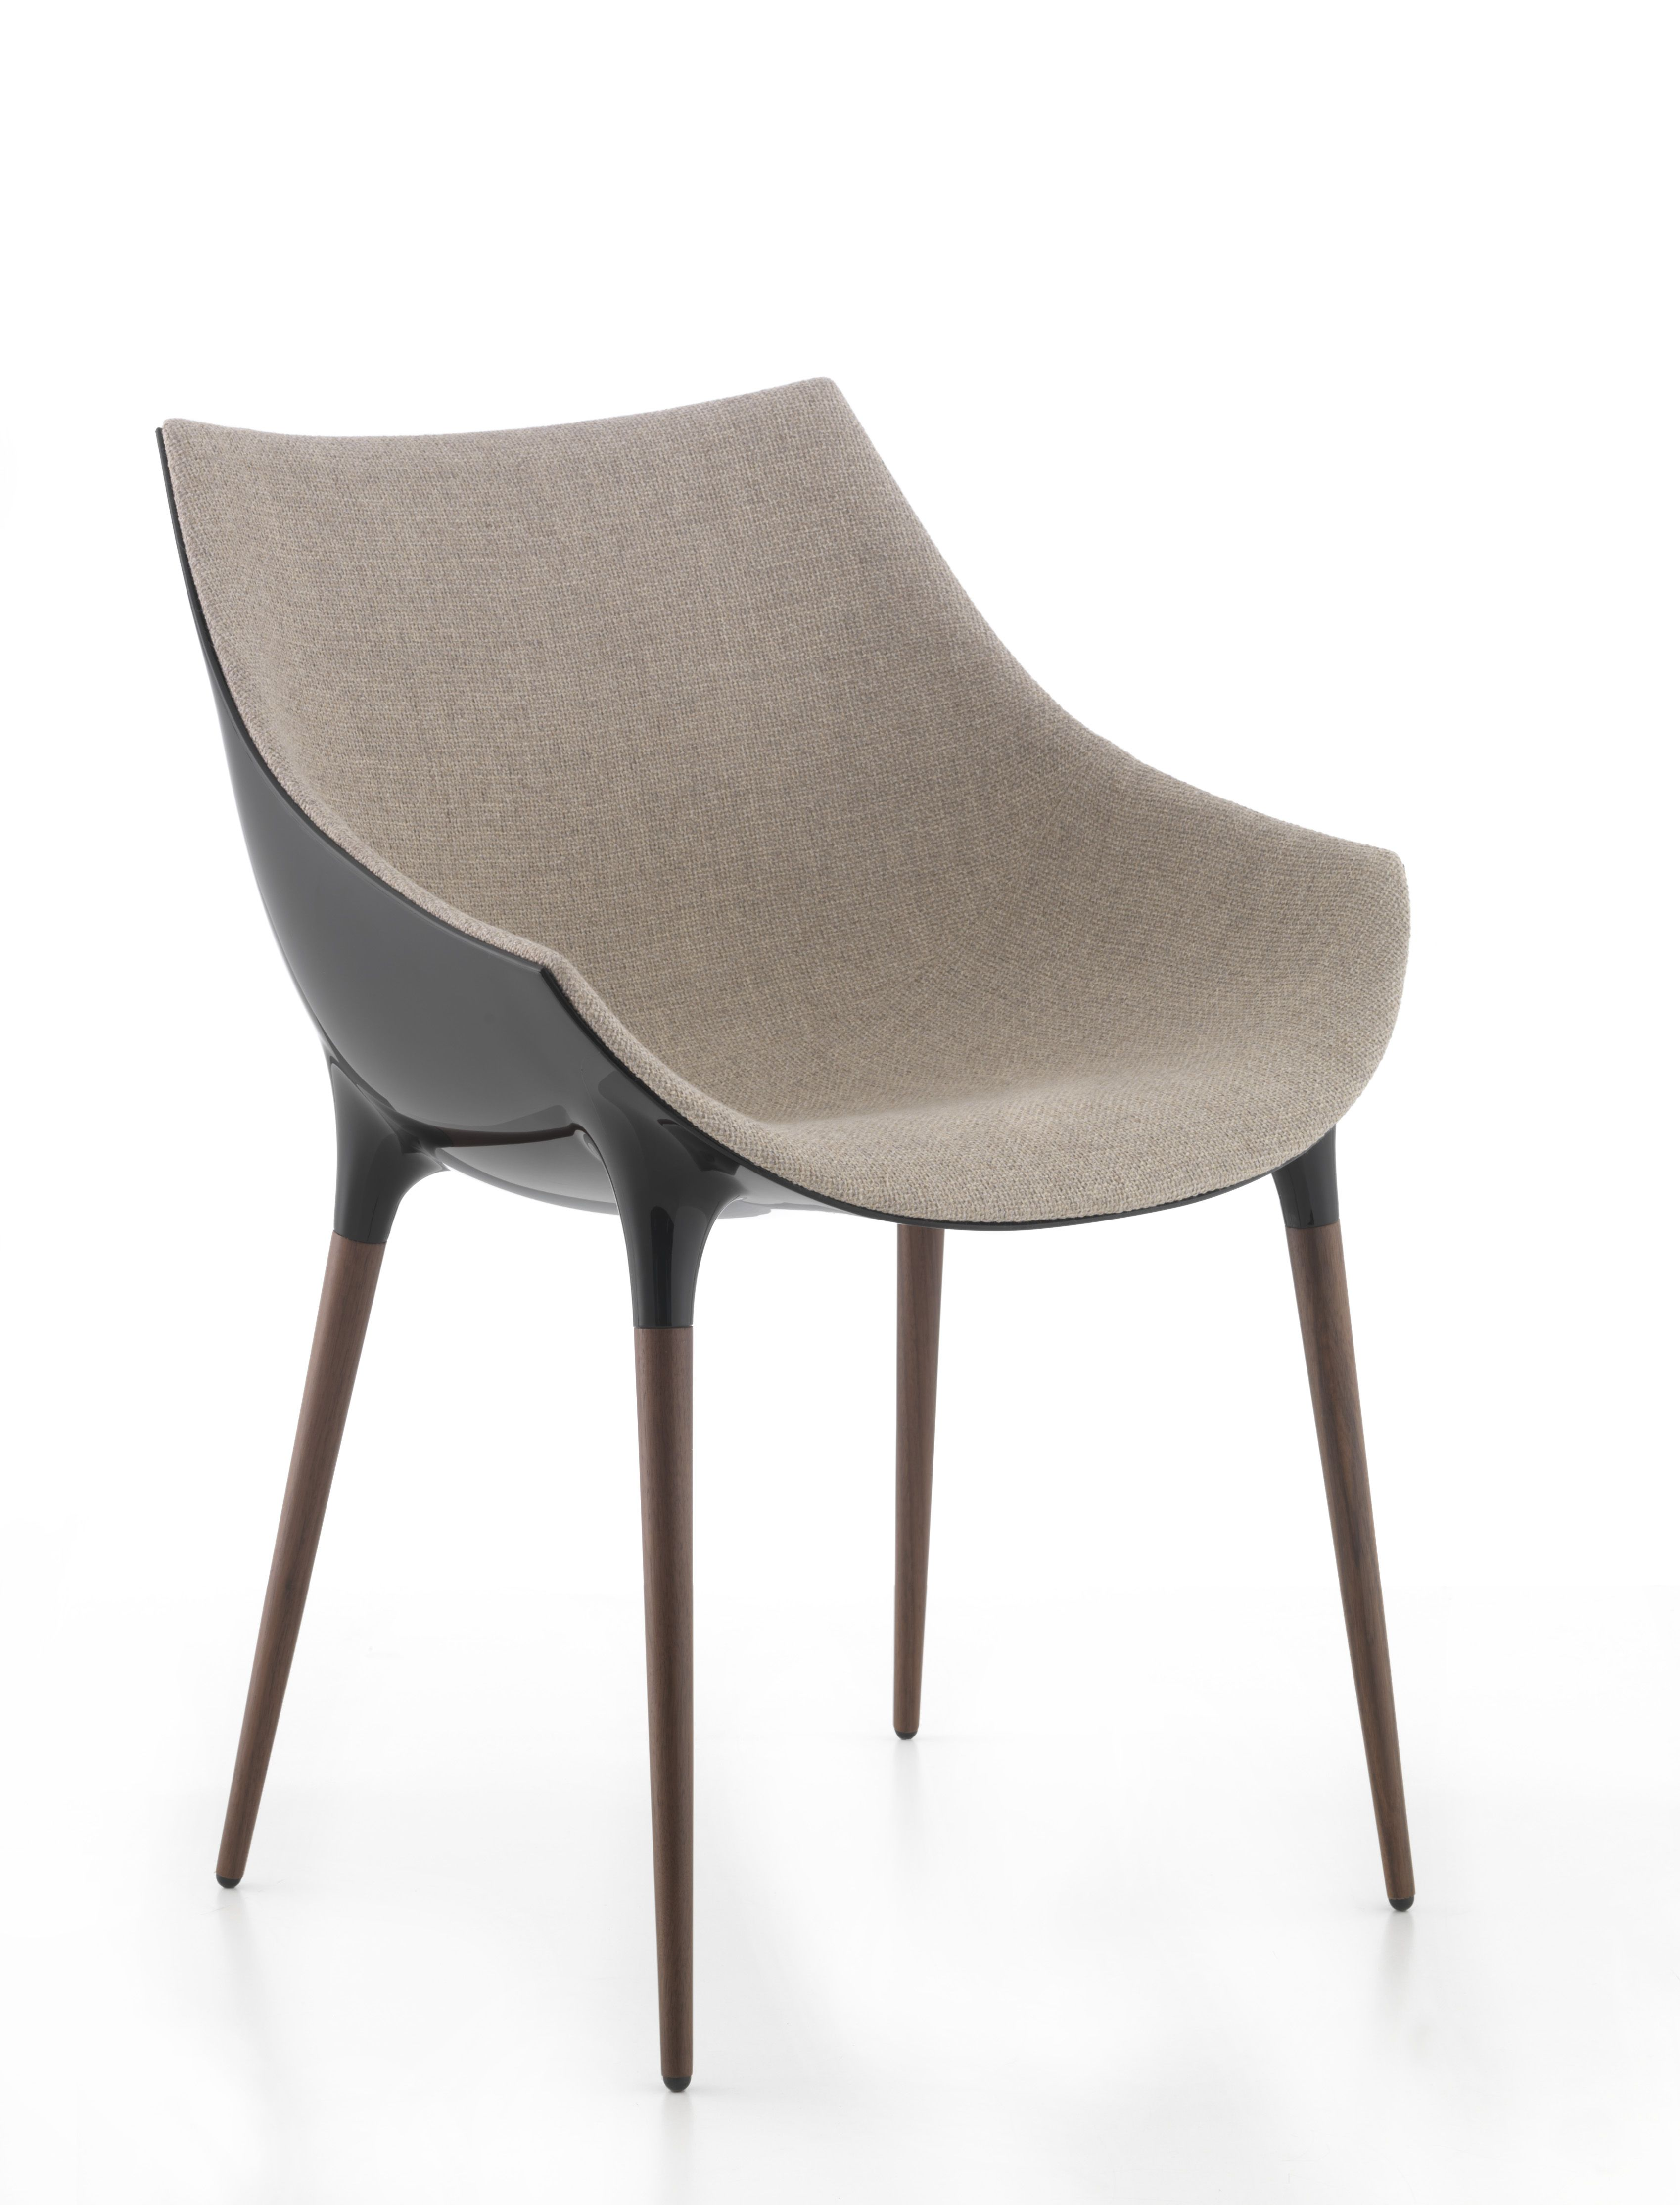 Living Room Bedroom Combo Ideas, 50 Philippe Starck Ideas Philippe Starck Design Furniture Design